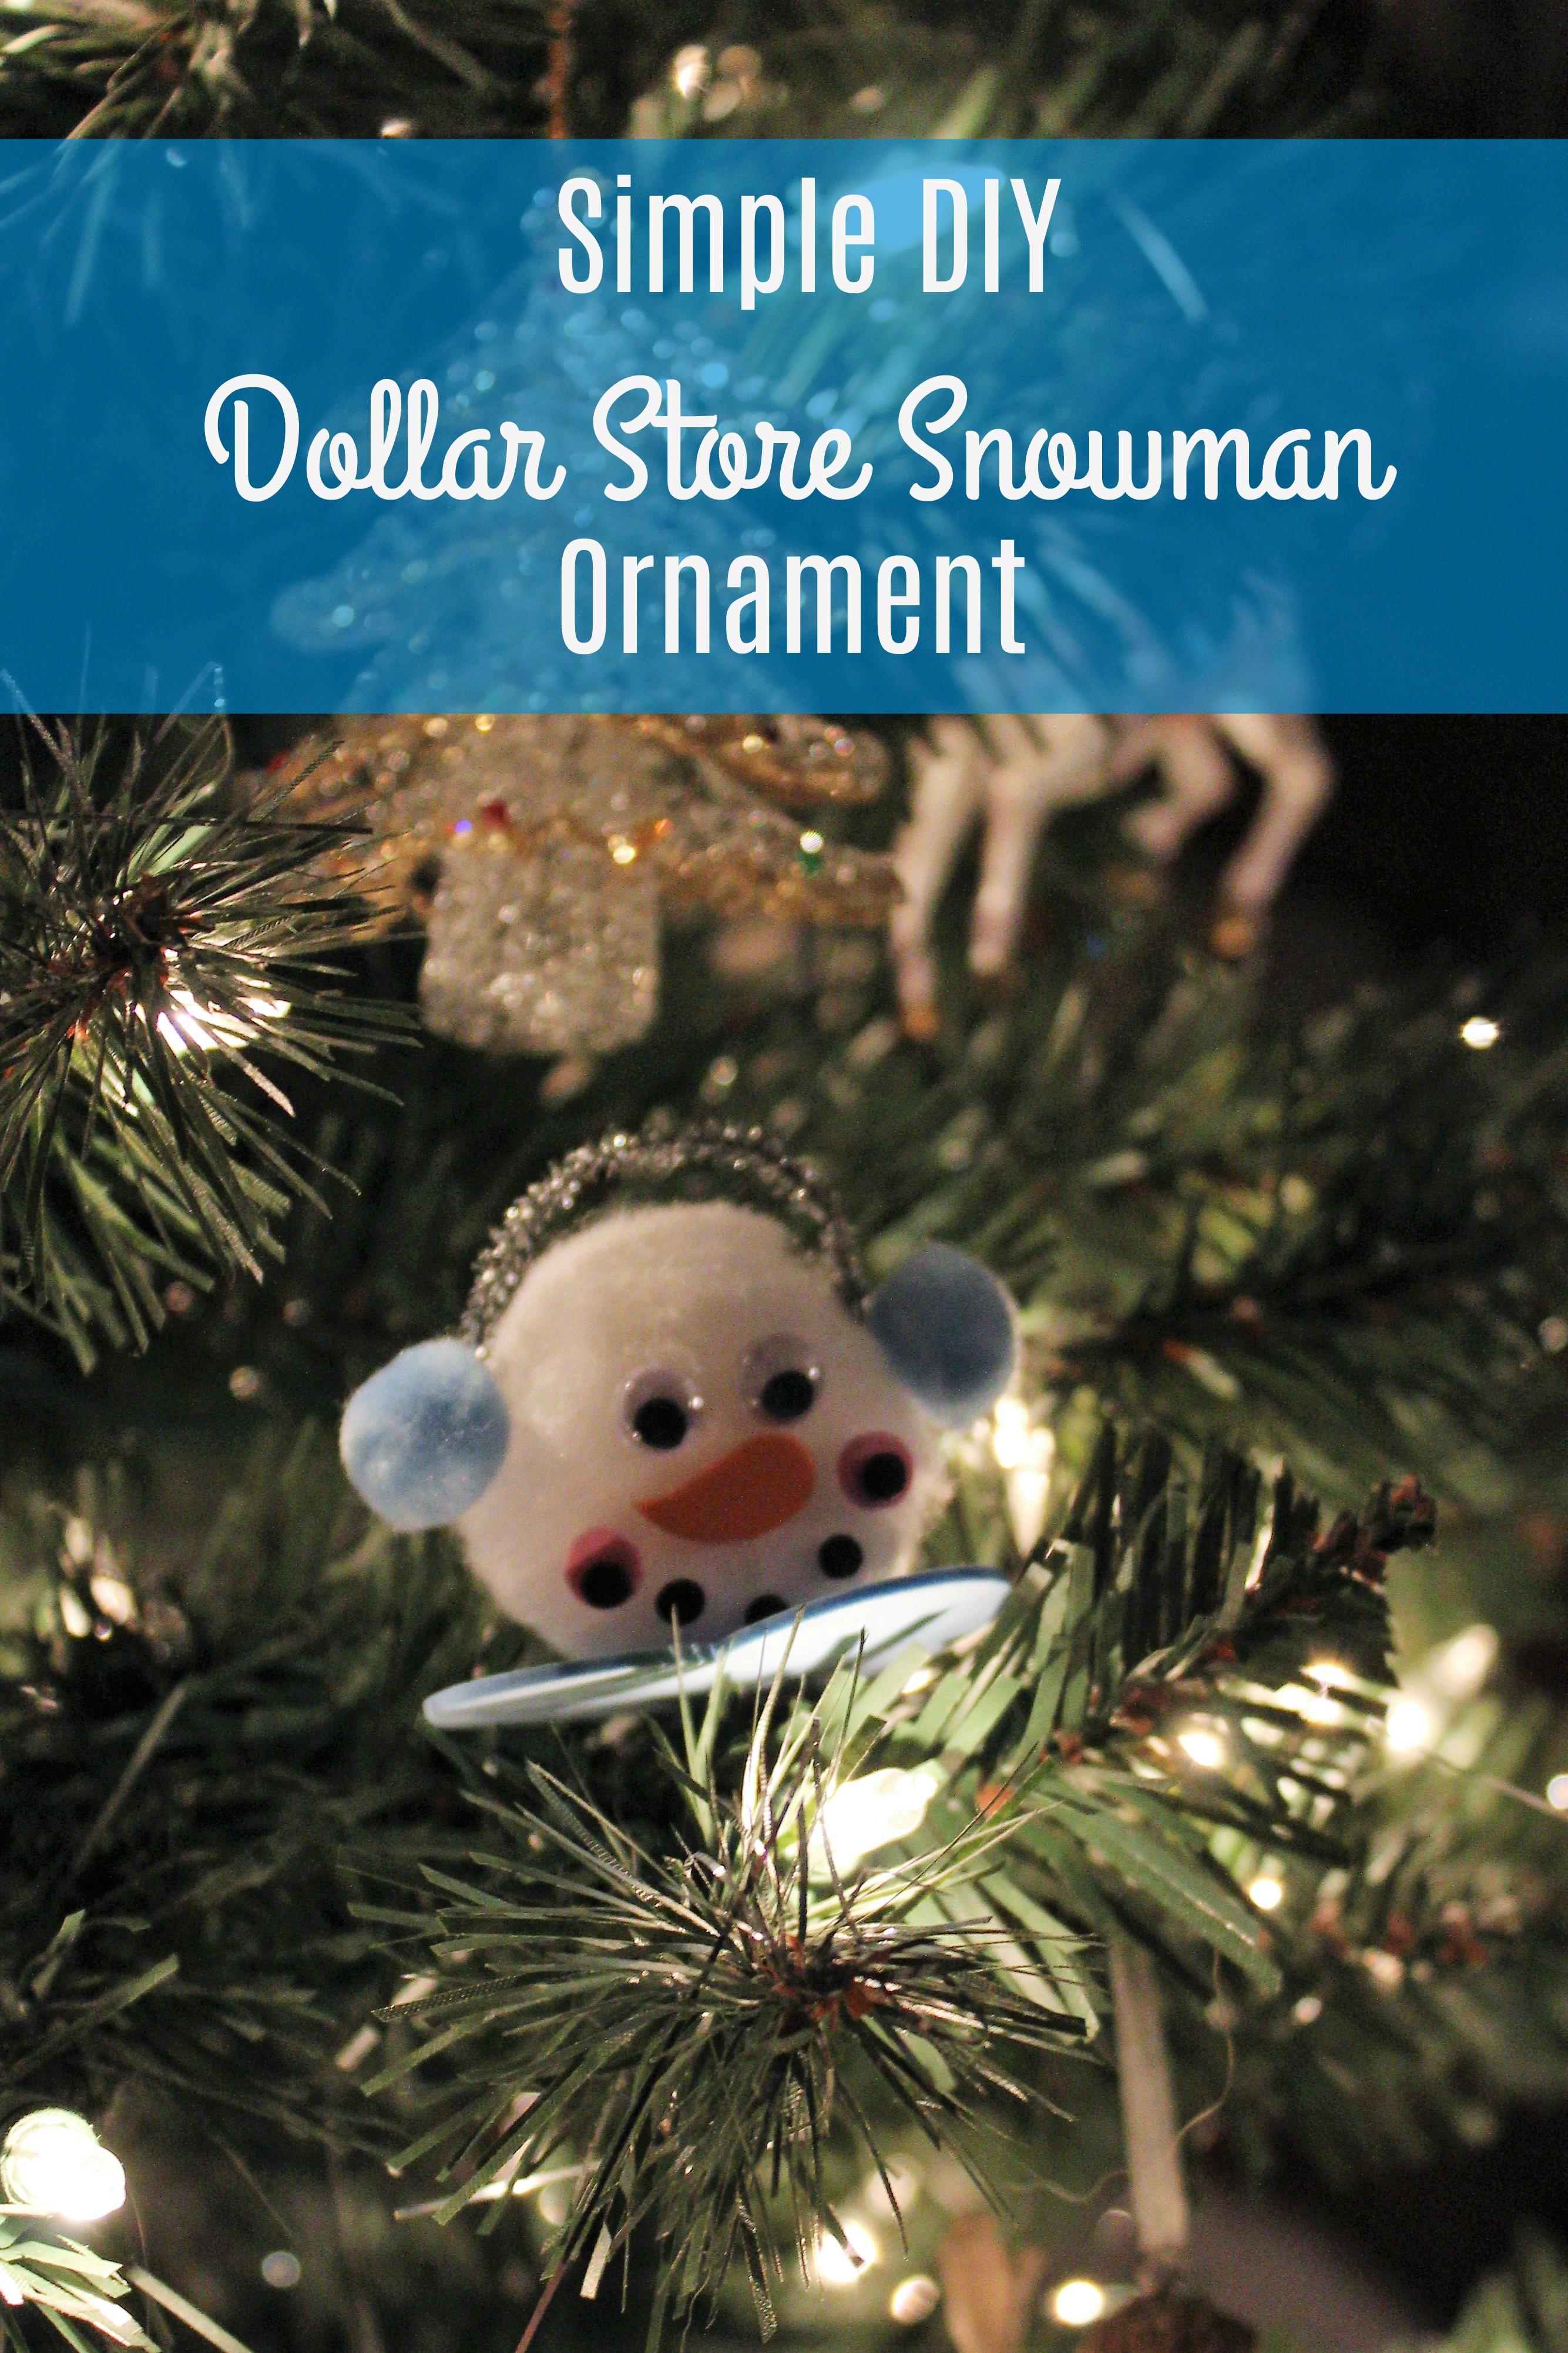 Diy Dollar Store Snowman Ornament Creative Cynchronicity